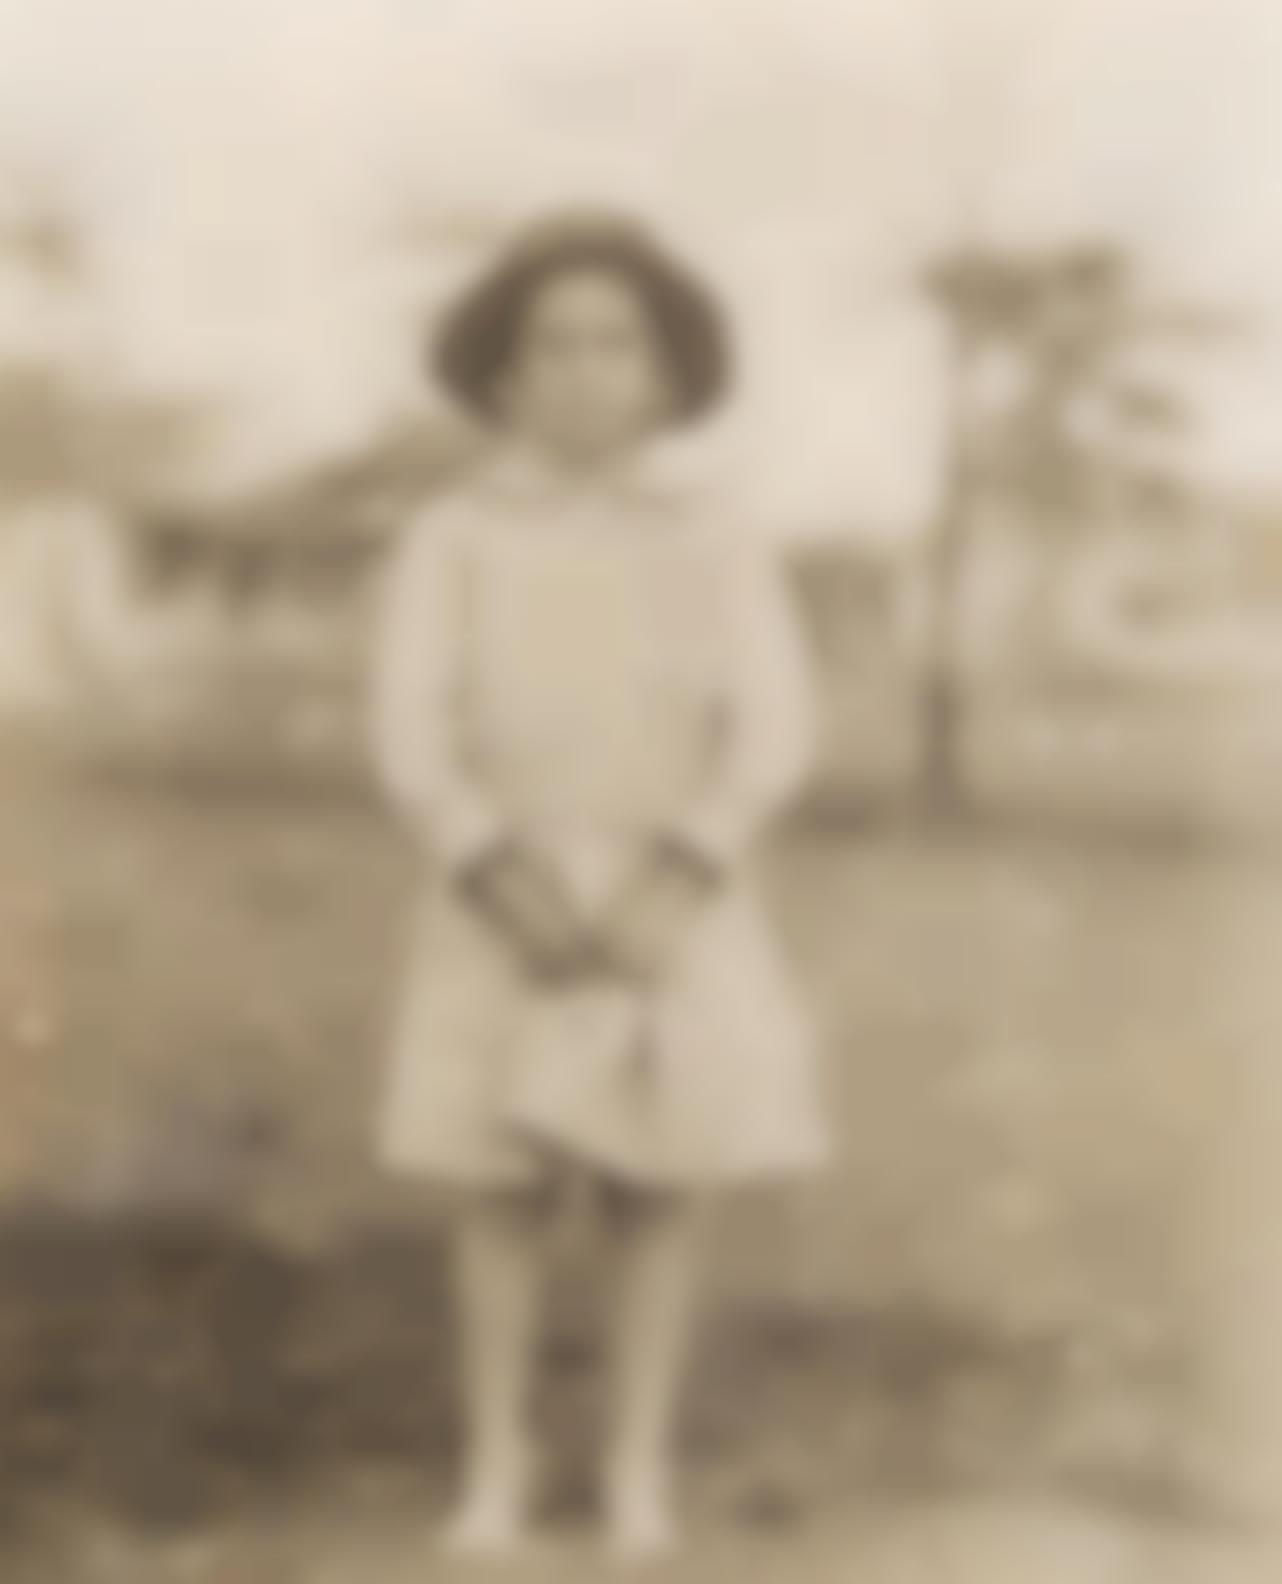 Lewis Wickes Hine-Child Labor Studies, c. 1908-1912-1912